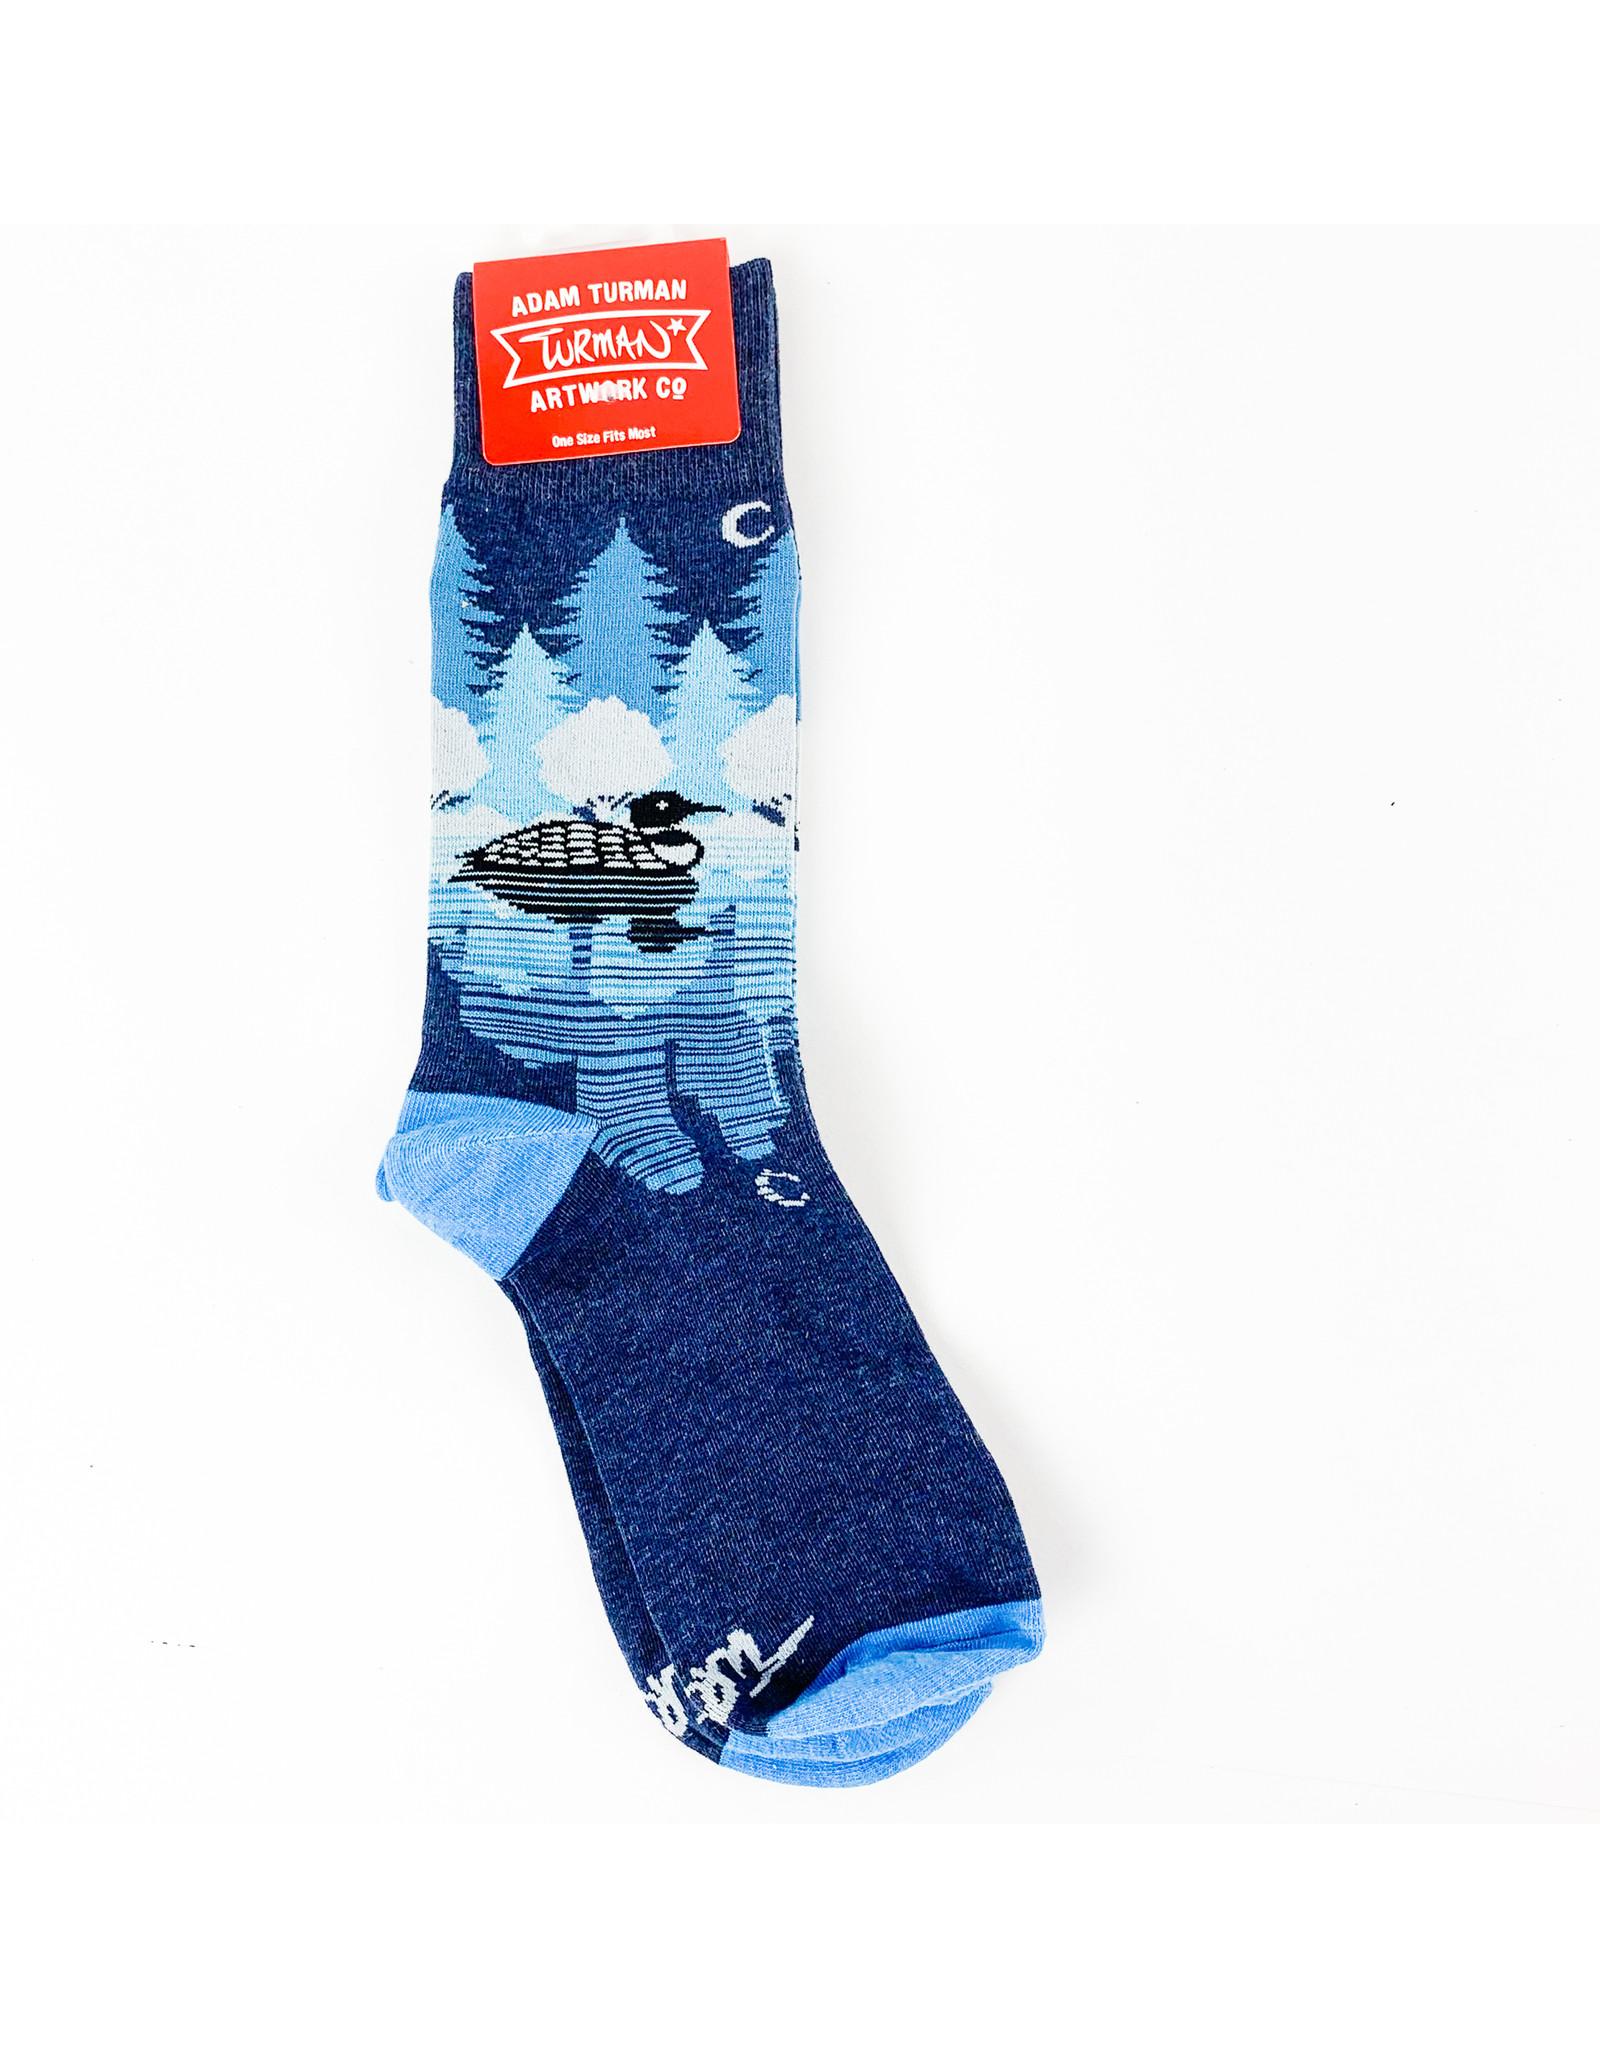 Truman Merch Co Midnight Loon Socks